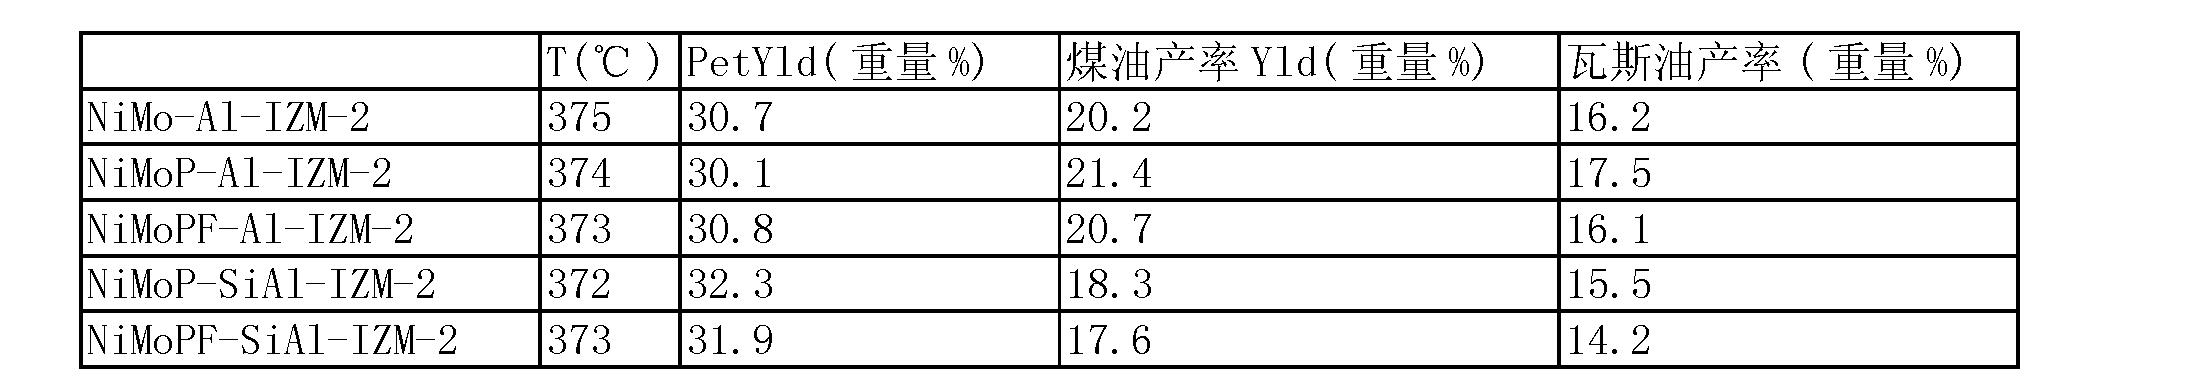 CN102176970B - Catalyst based on IZM-2 zeolite and process